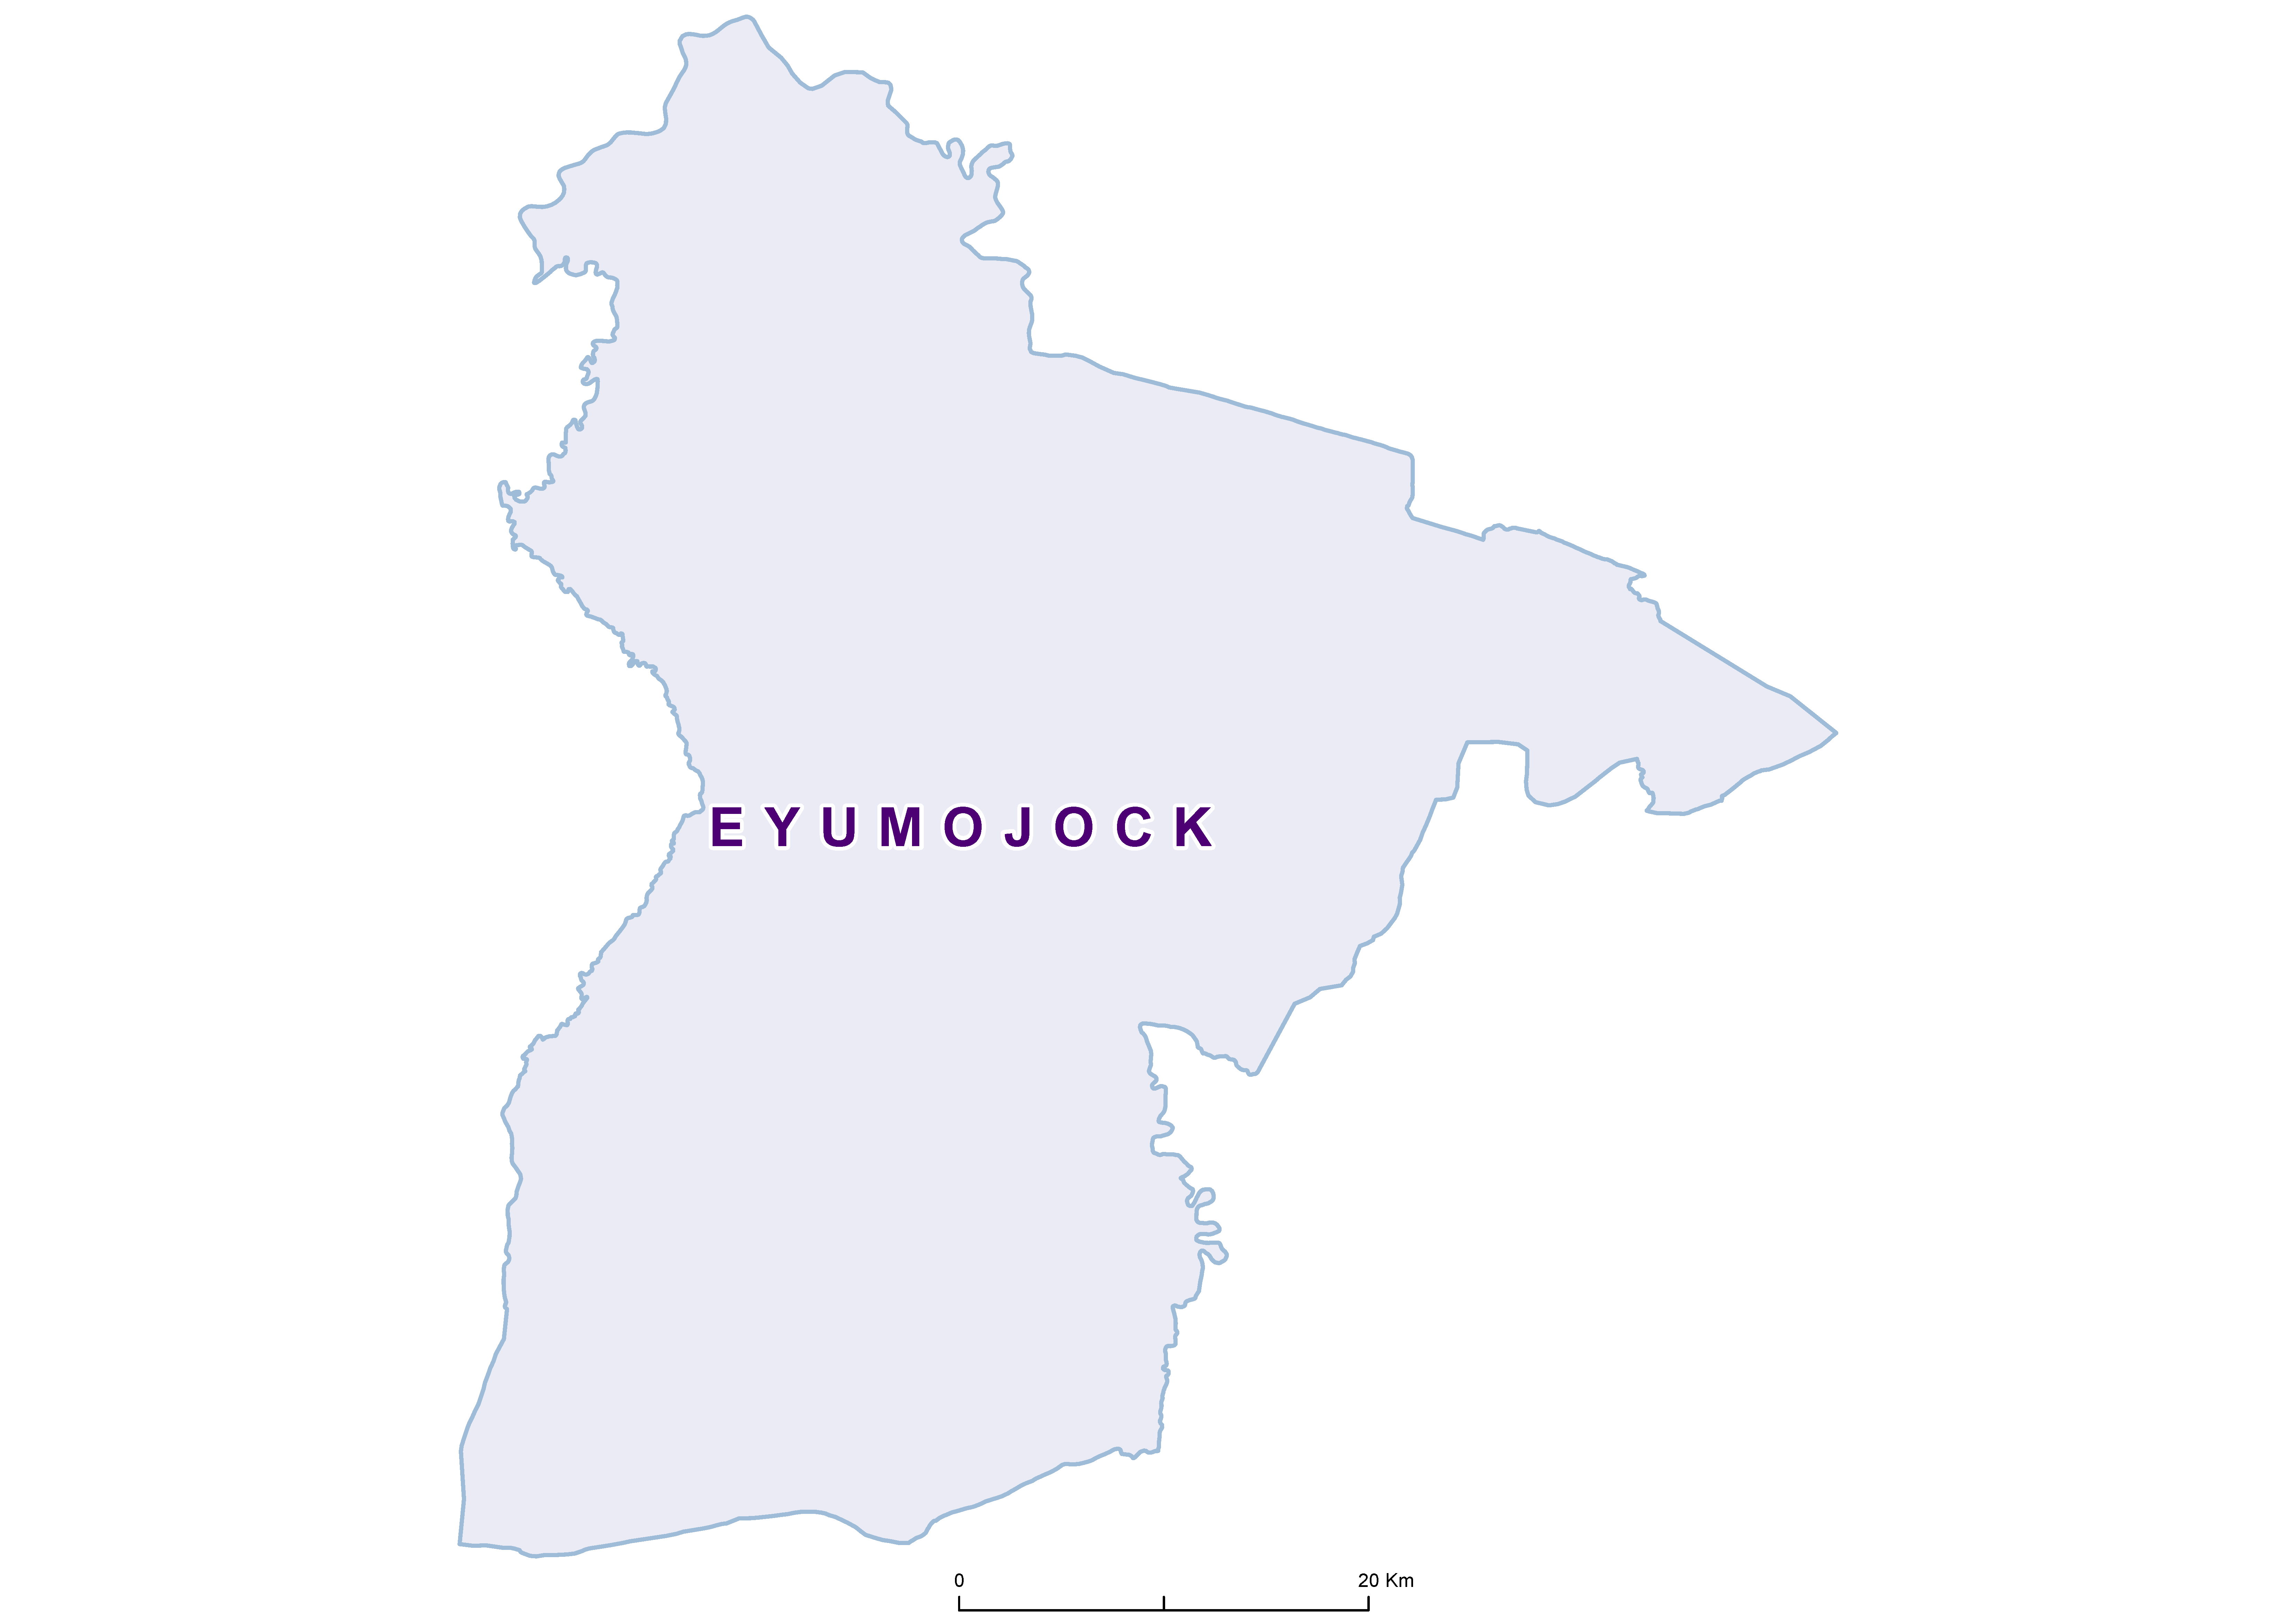 Eyumojock Mean SCH 19850001